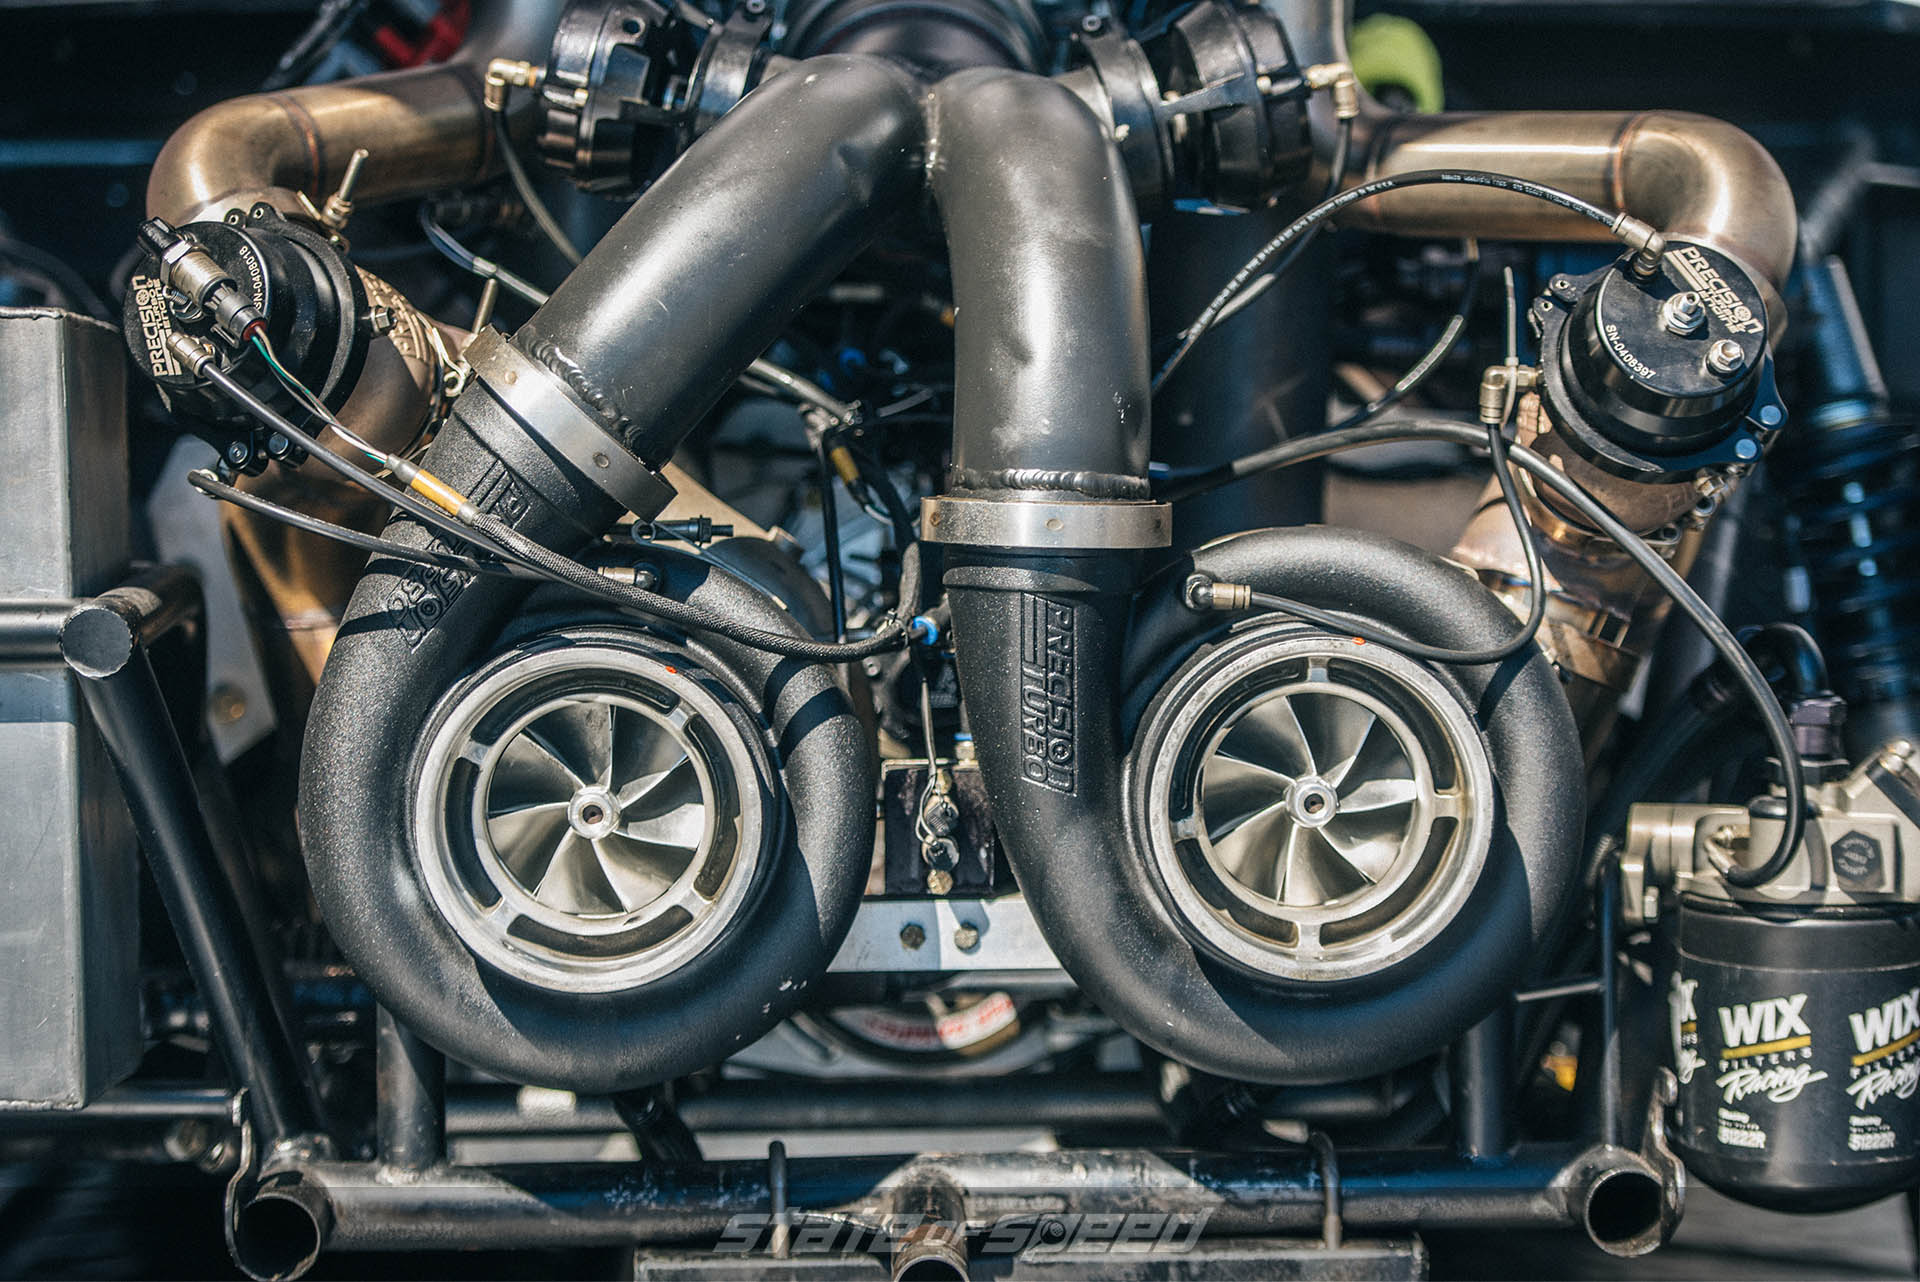 precision Twin turbo engine